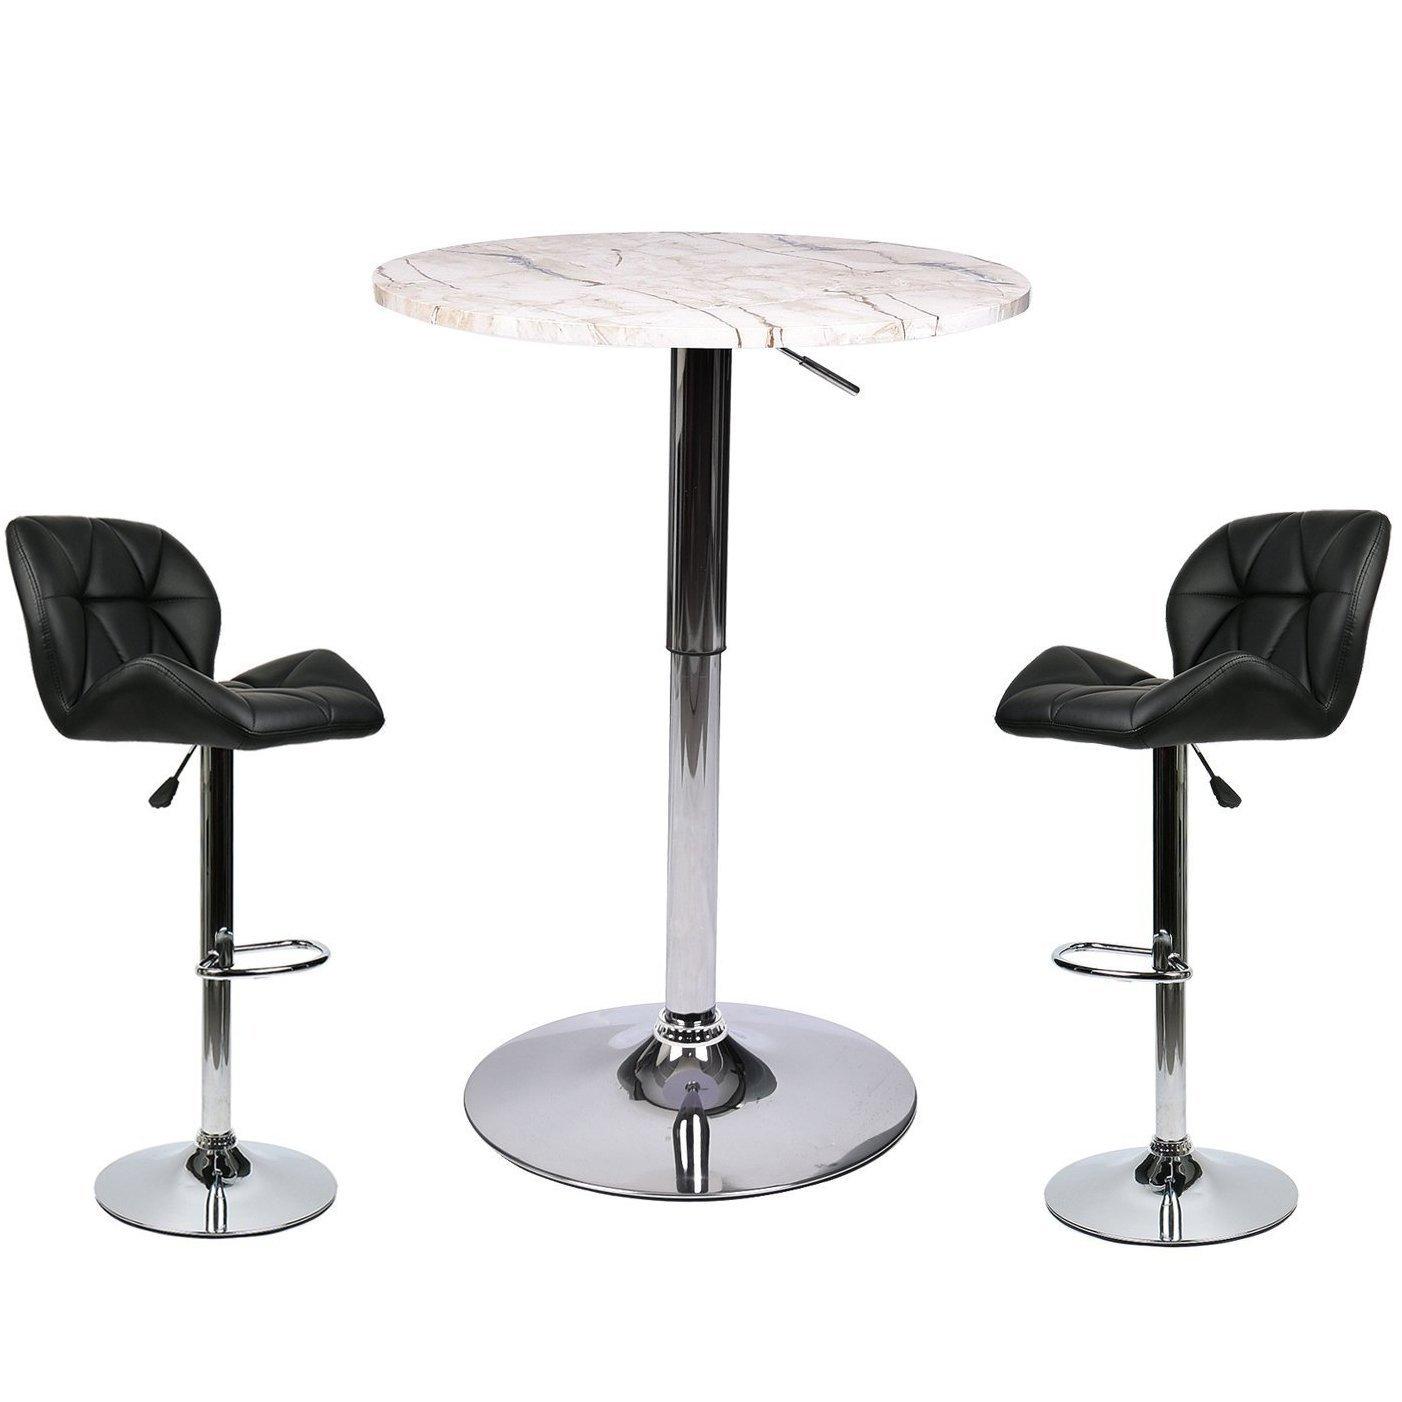 Bar Table Stools Set - 3 Piece Pub Dining Kitchen Furniture (Black 3)